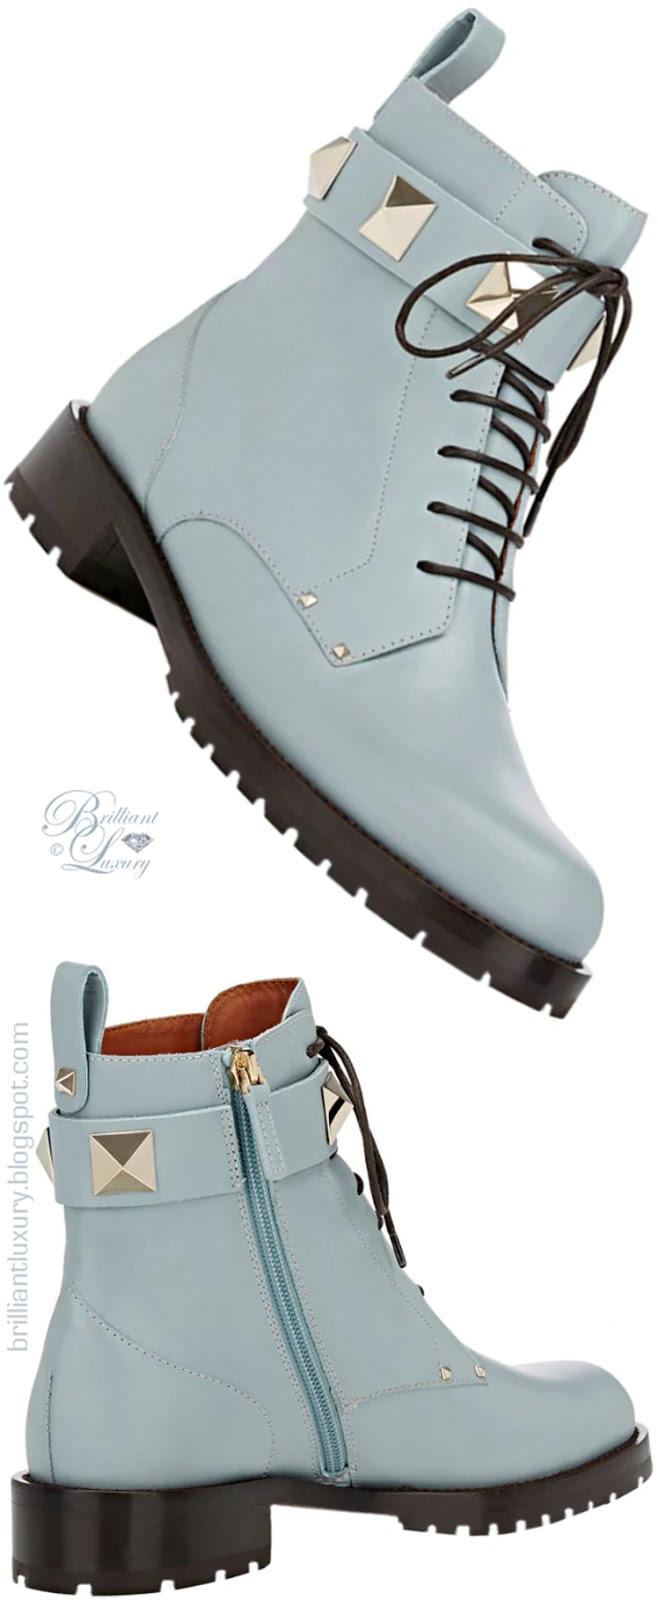 Brilliant Luxury ♦ Valentino Garavani Rockstud blue leather combat boots